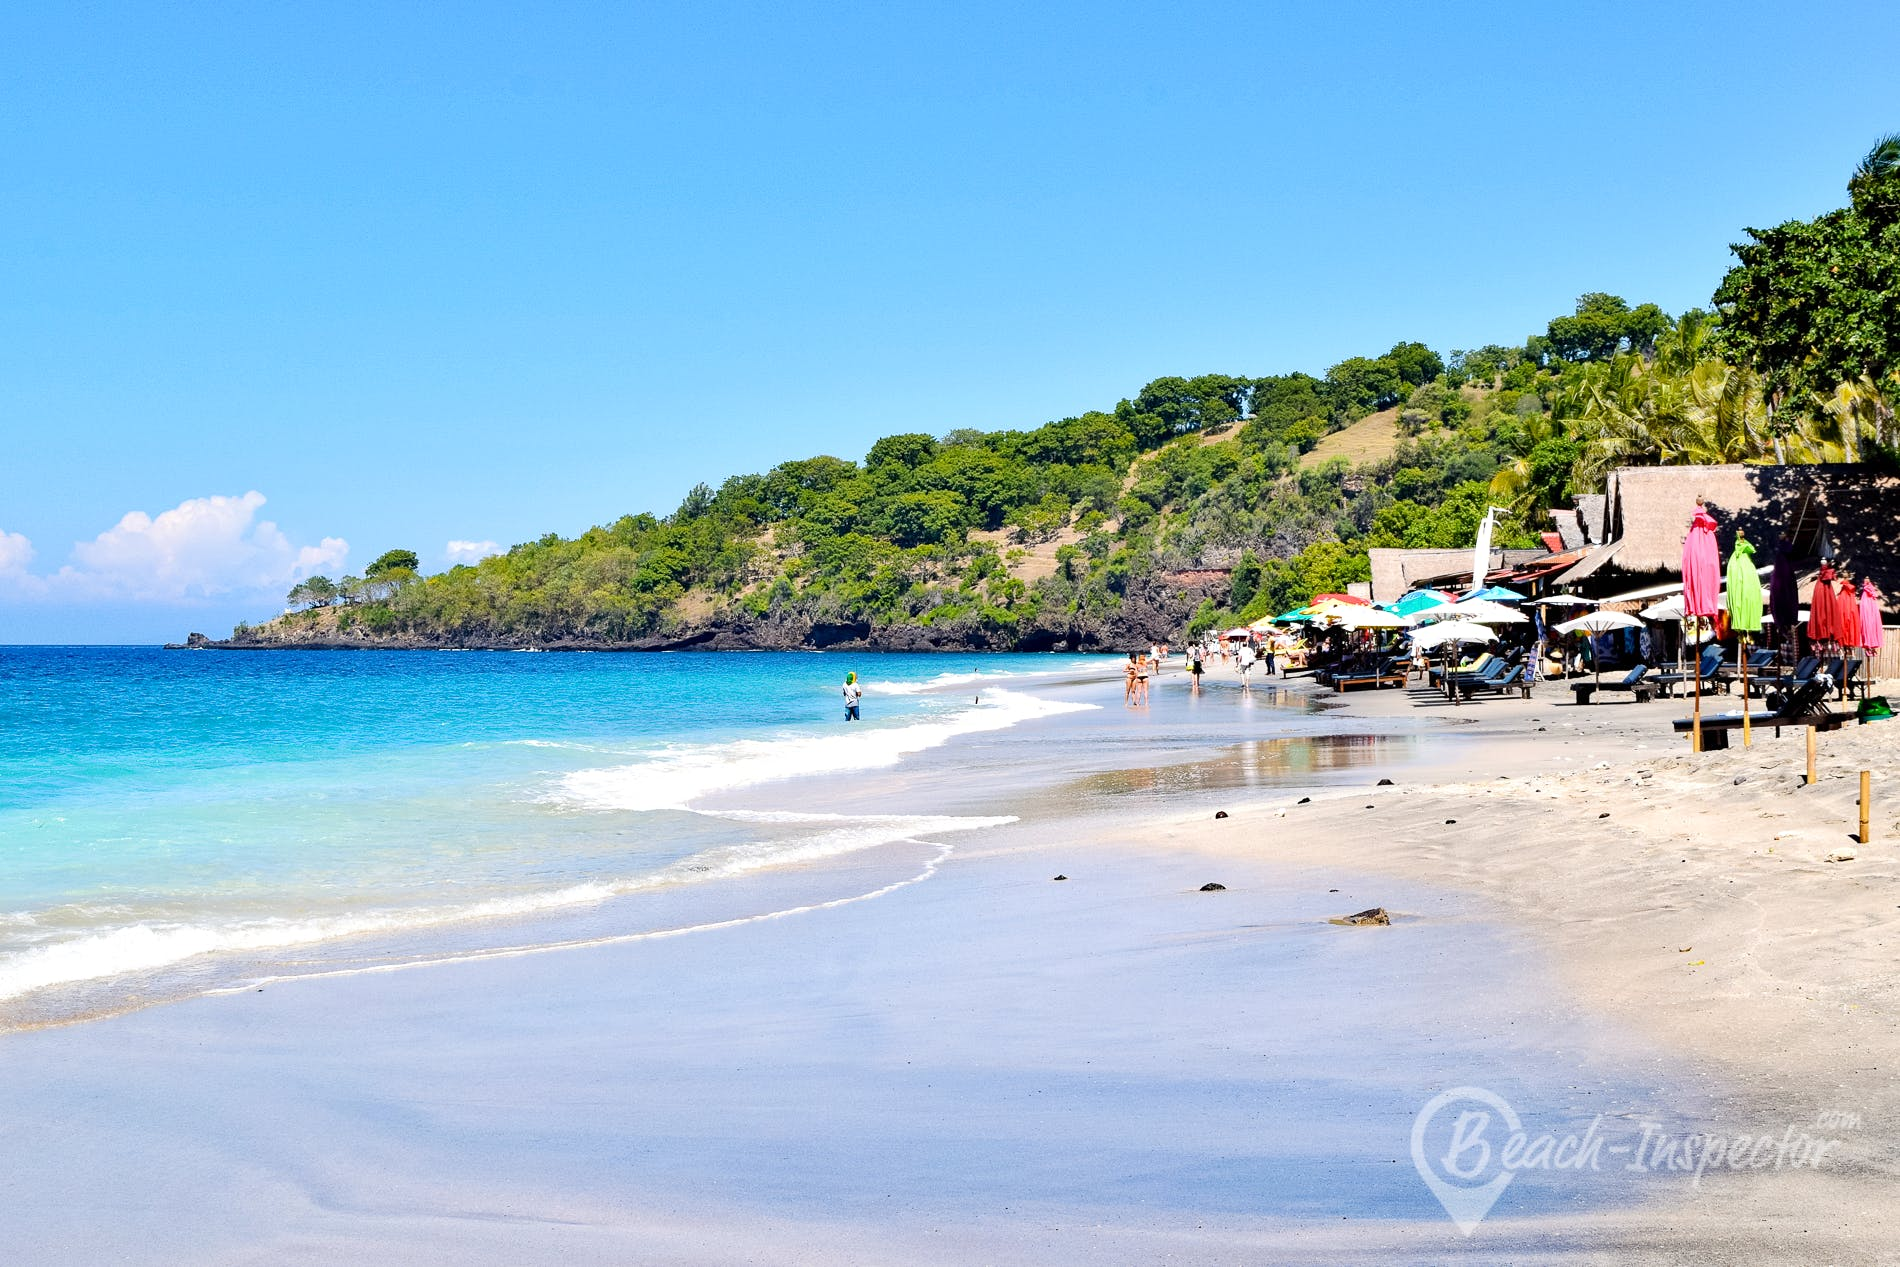 Playa Virgin Beach, Bali, Indonesia